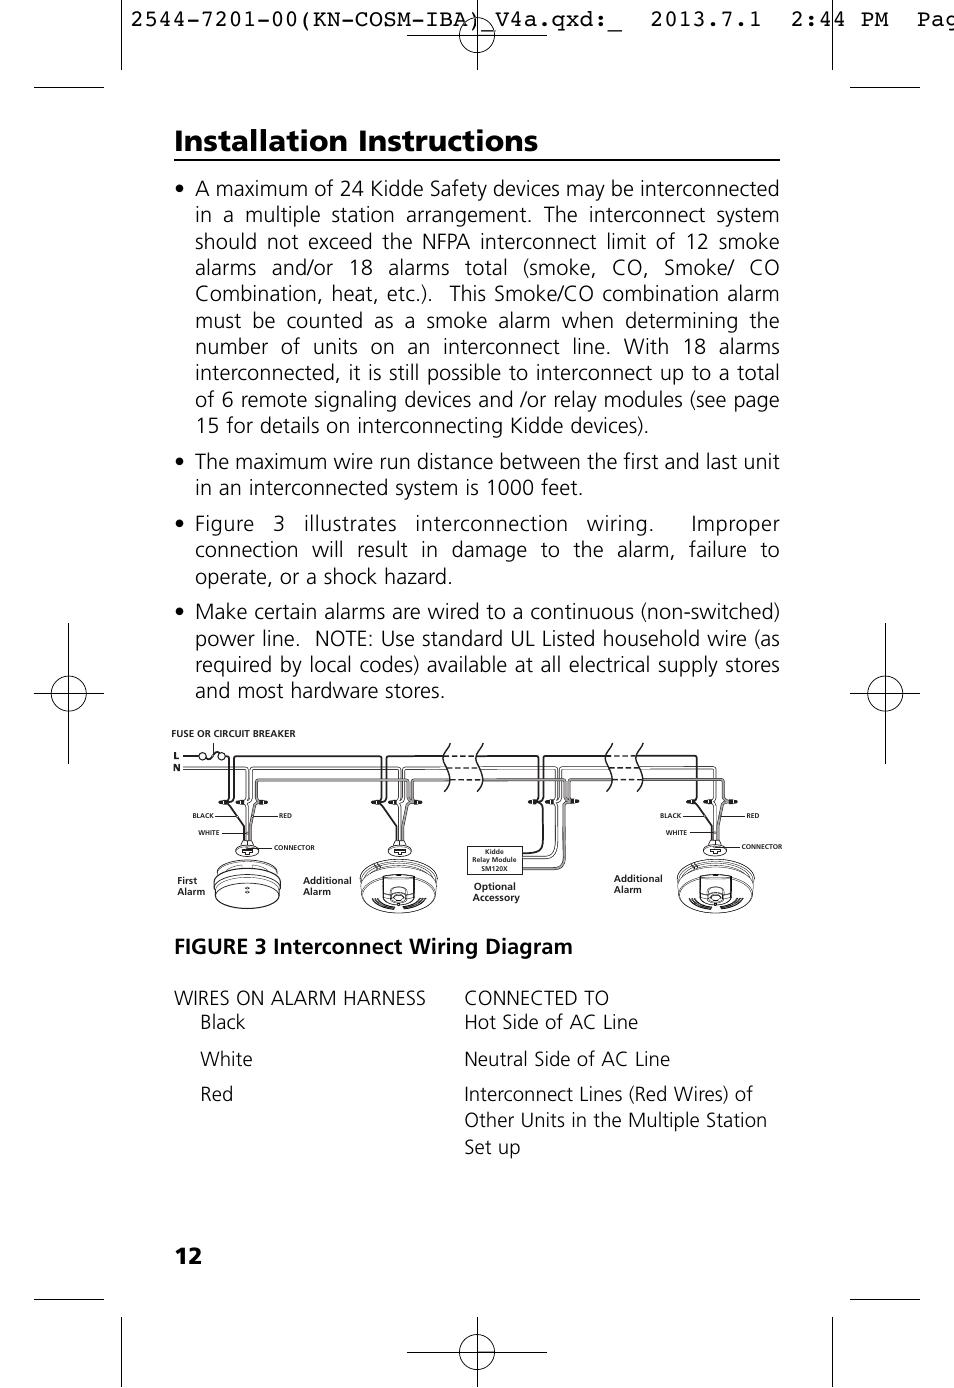 Installation Instructions  Figure 3 Interconnect Wiring